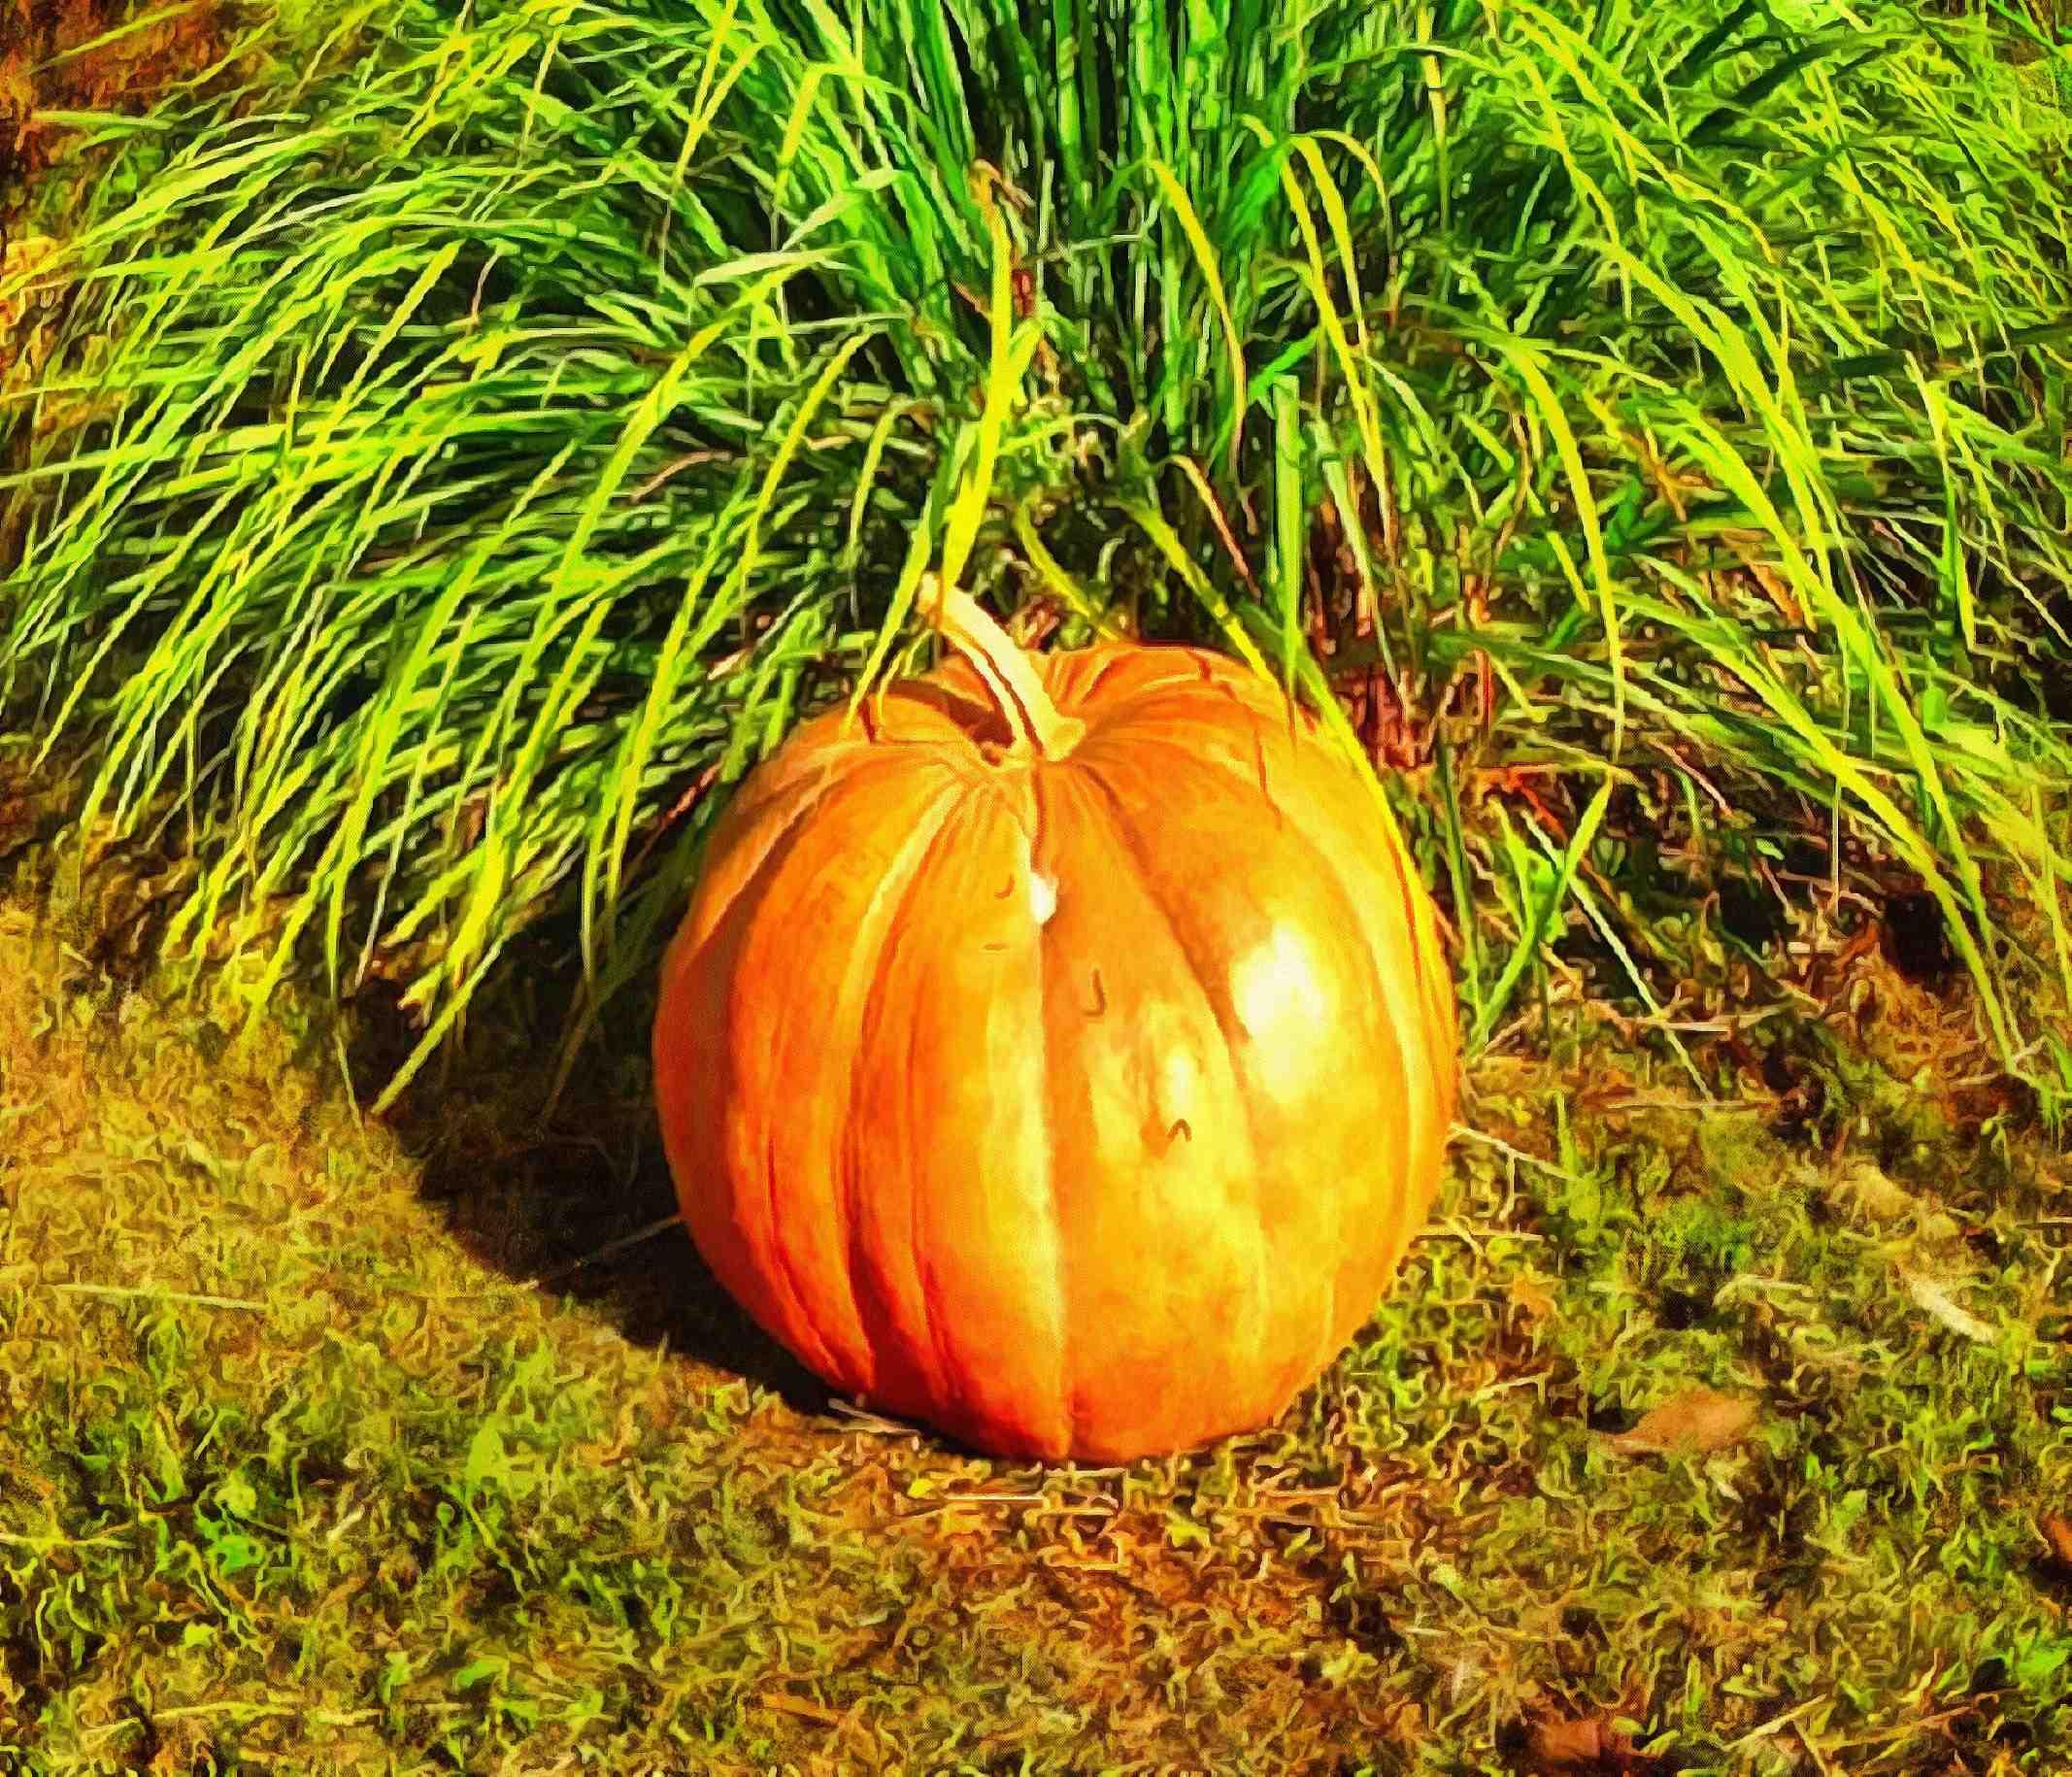 vegetables, harvest, pumpkin, thanksgiving, holiday, - thanksgiving, stock free image, public domain photos, free stock photo, download public domain images.